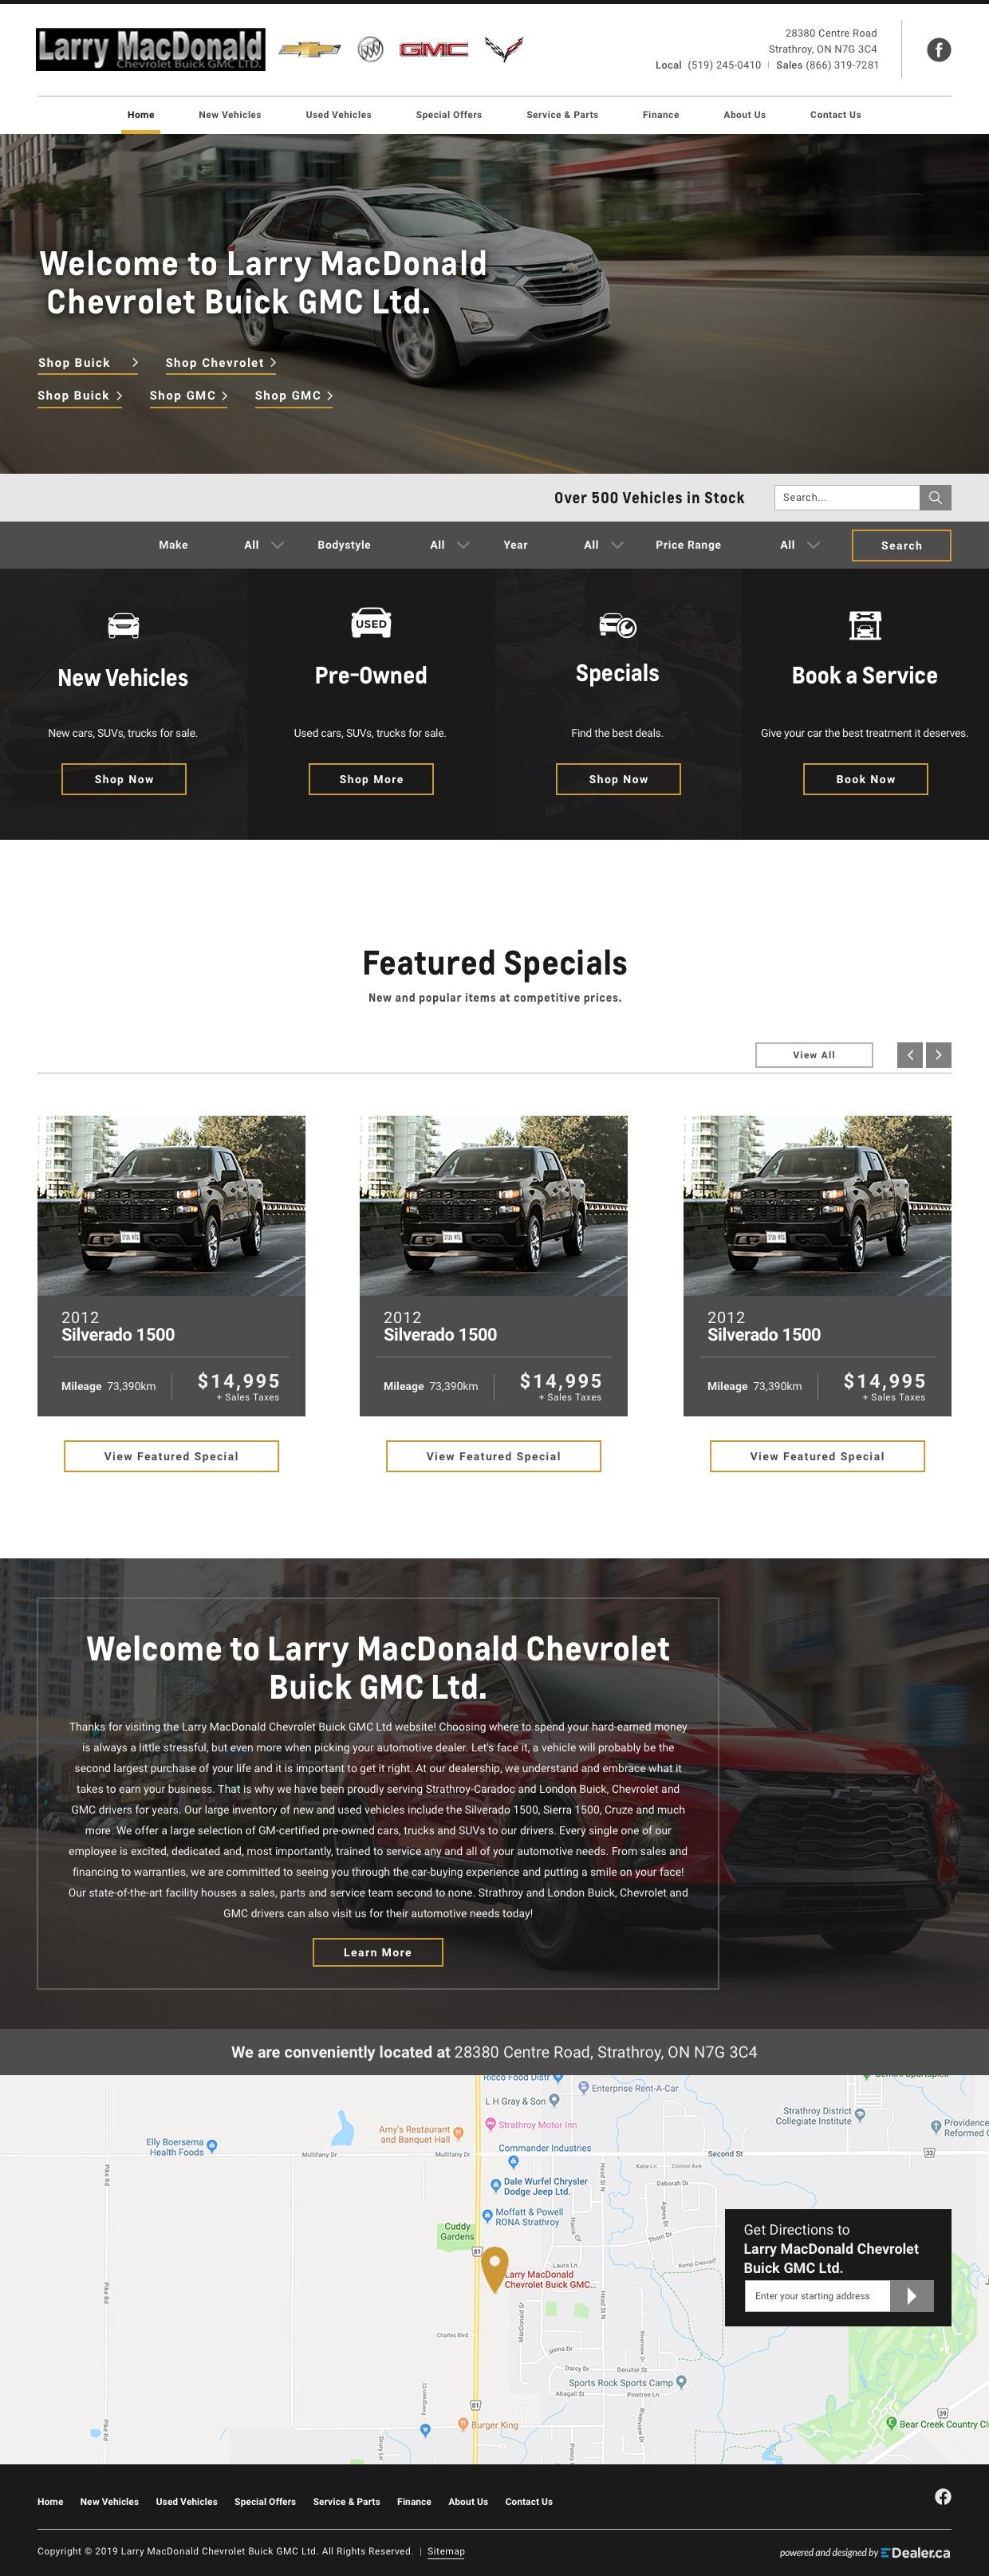 Larry MacDonald Chevrolet Buick GMC Ltd